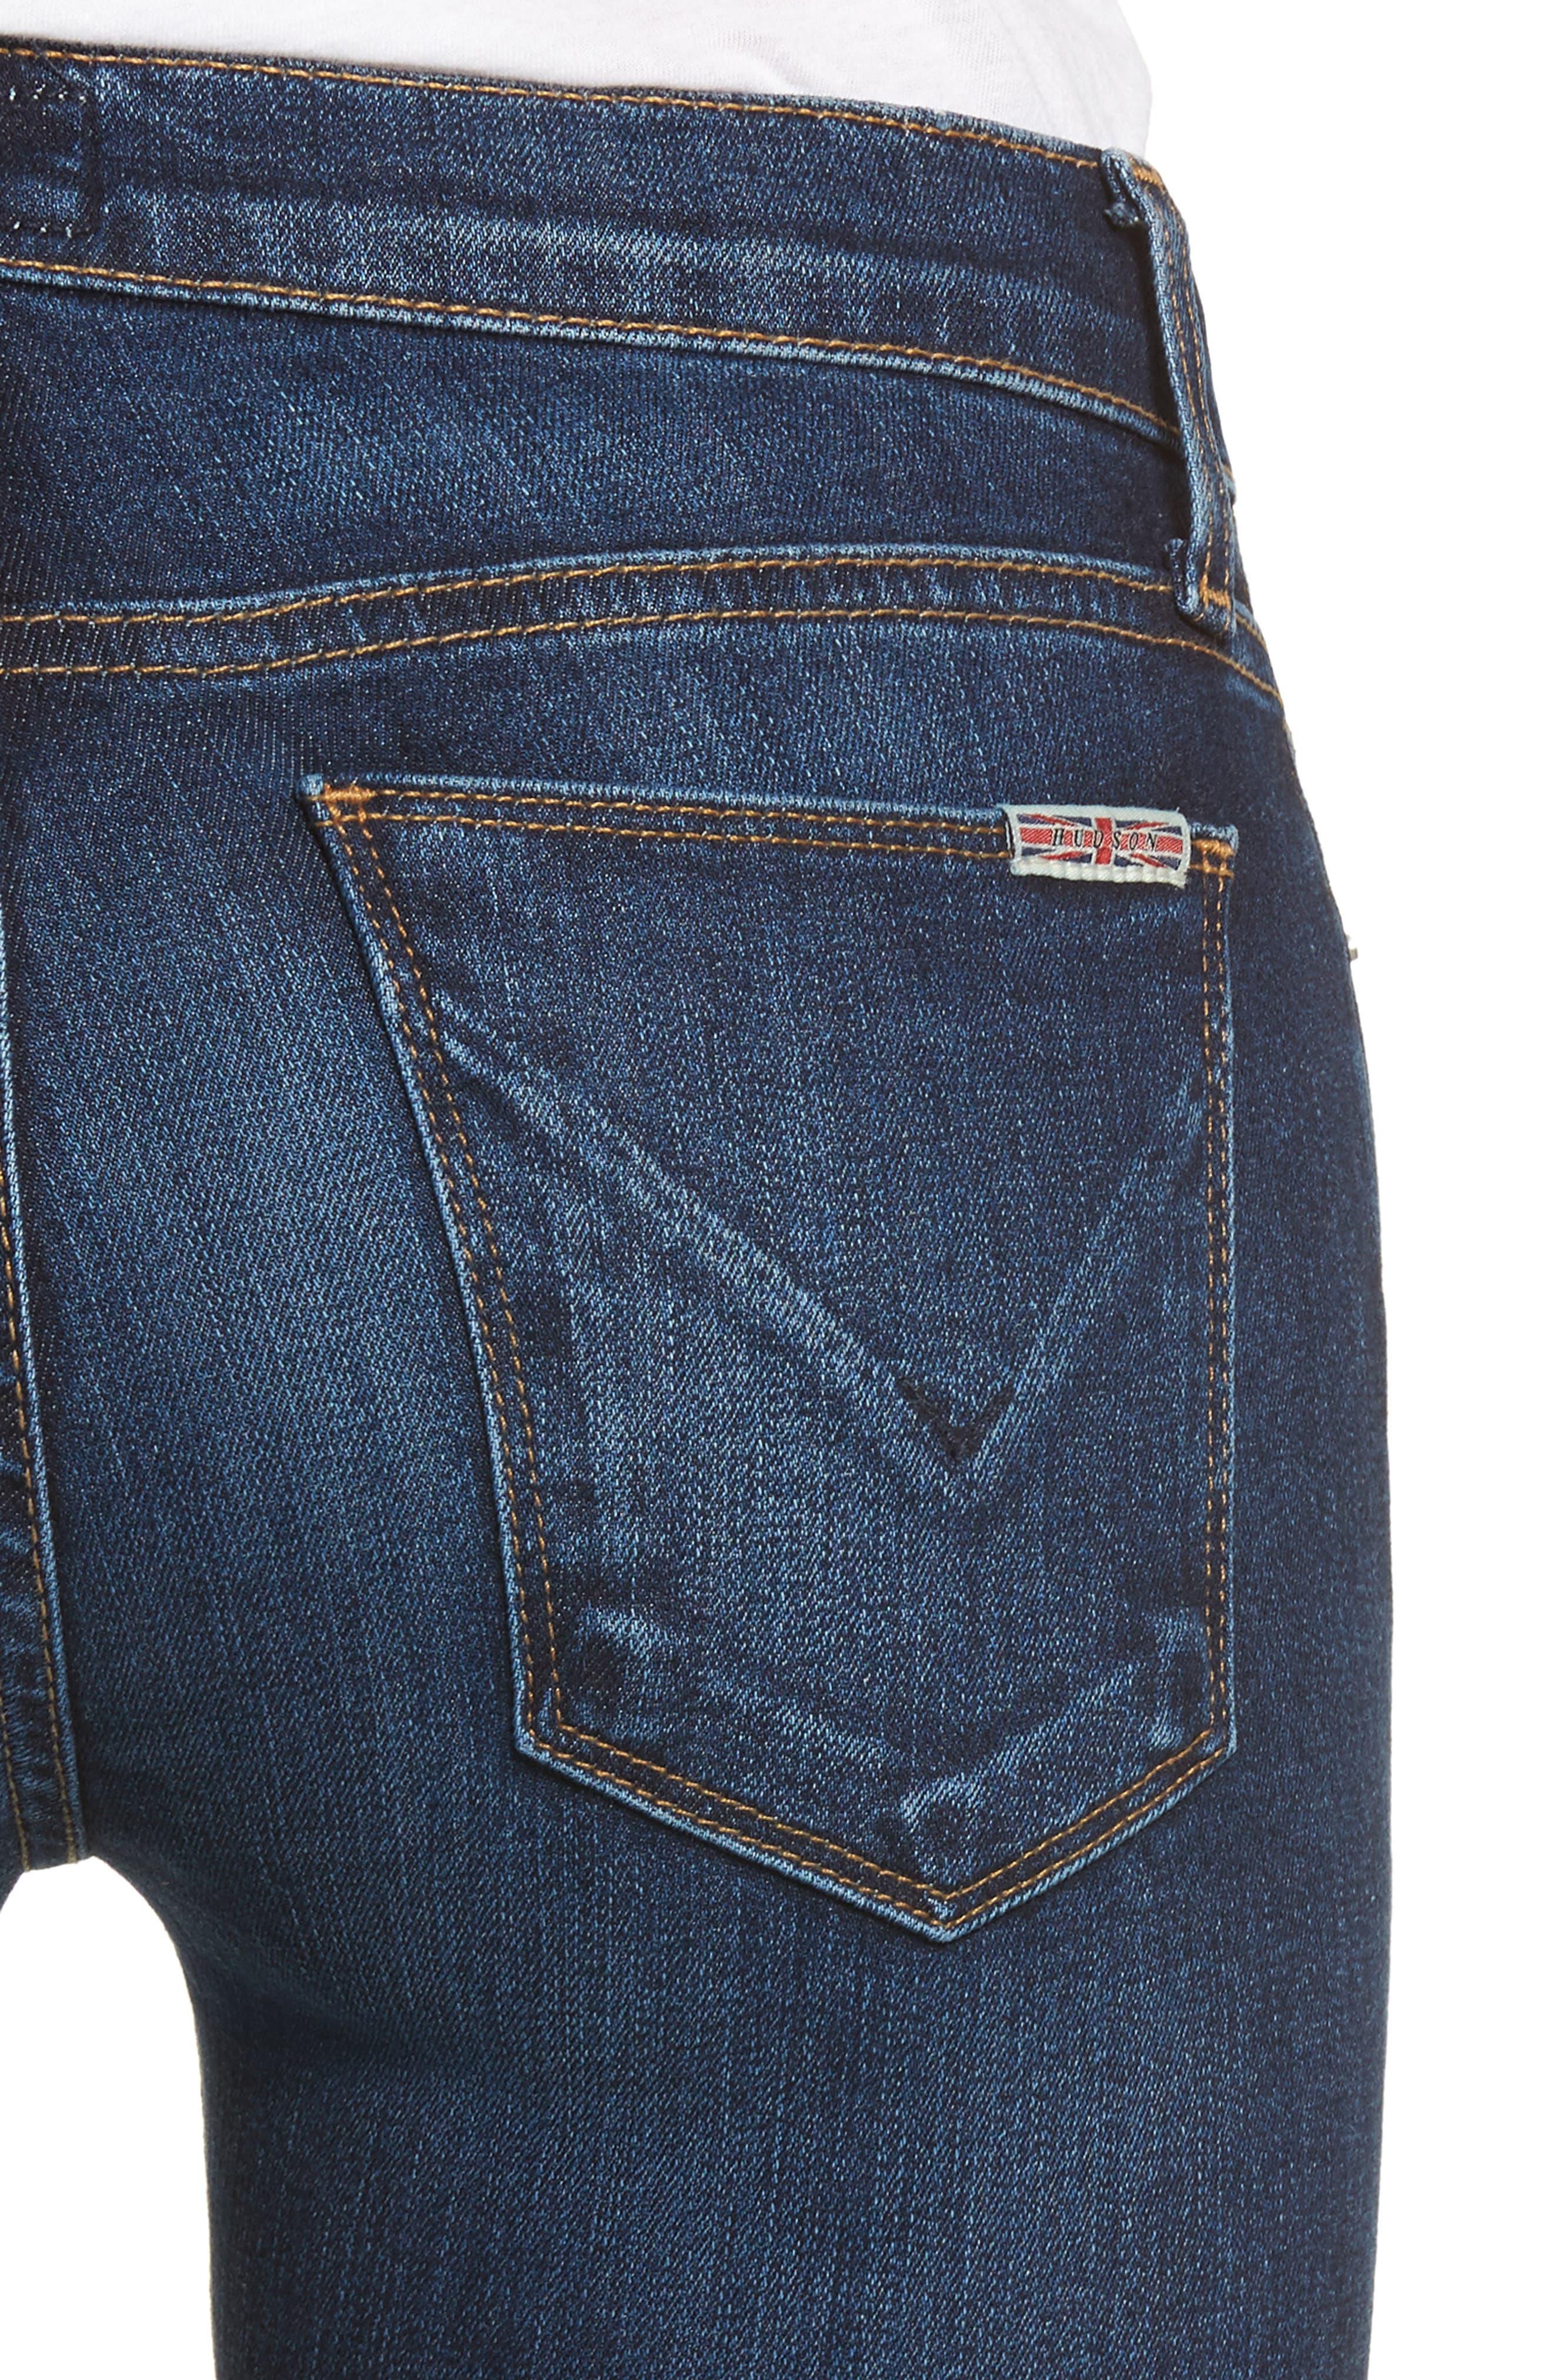 Alternate Image 4  - Hudson Jeans 'Krista' Super Skinny Jeans